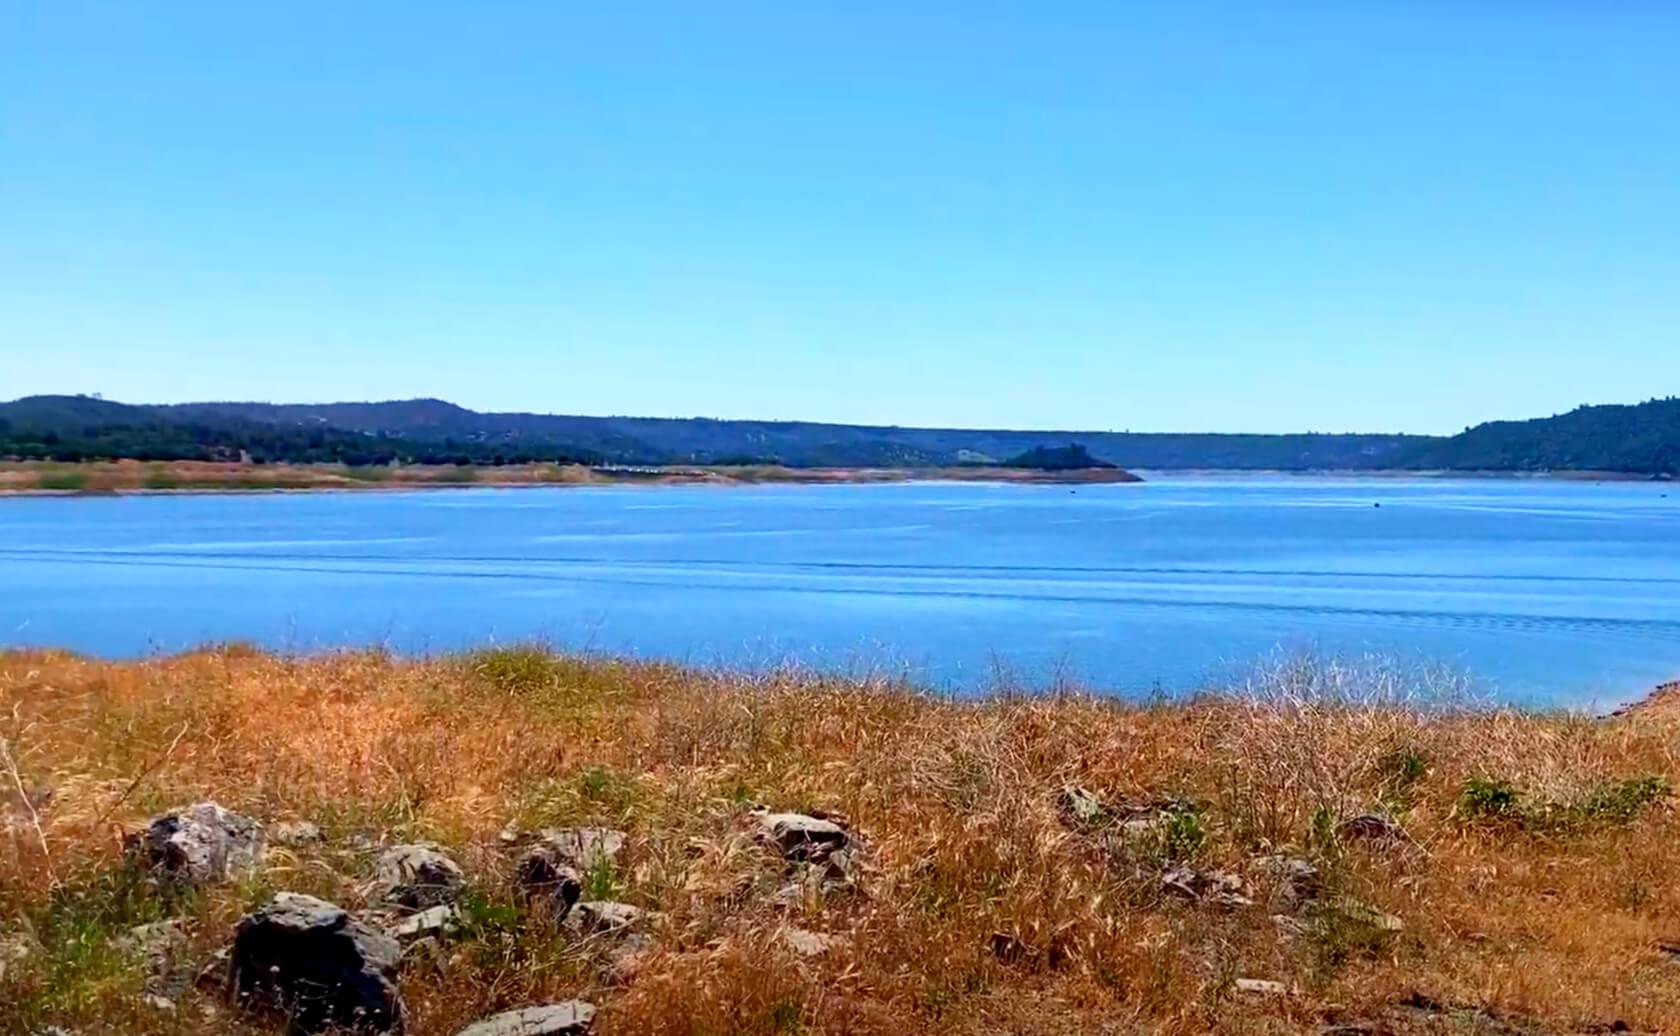 New-Melones-Lake-Fishing-Guide-Report-California-04